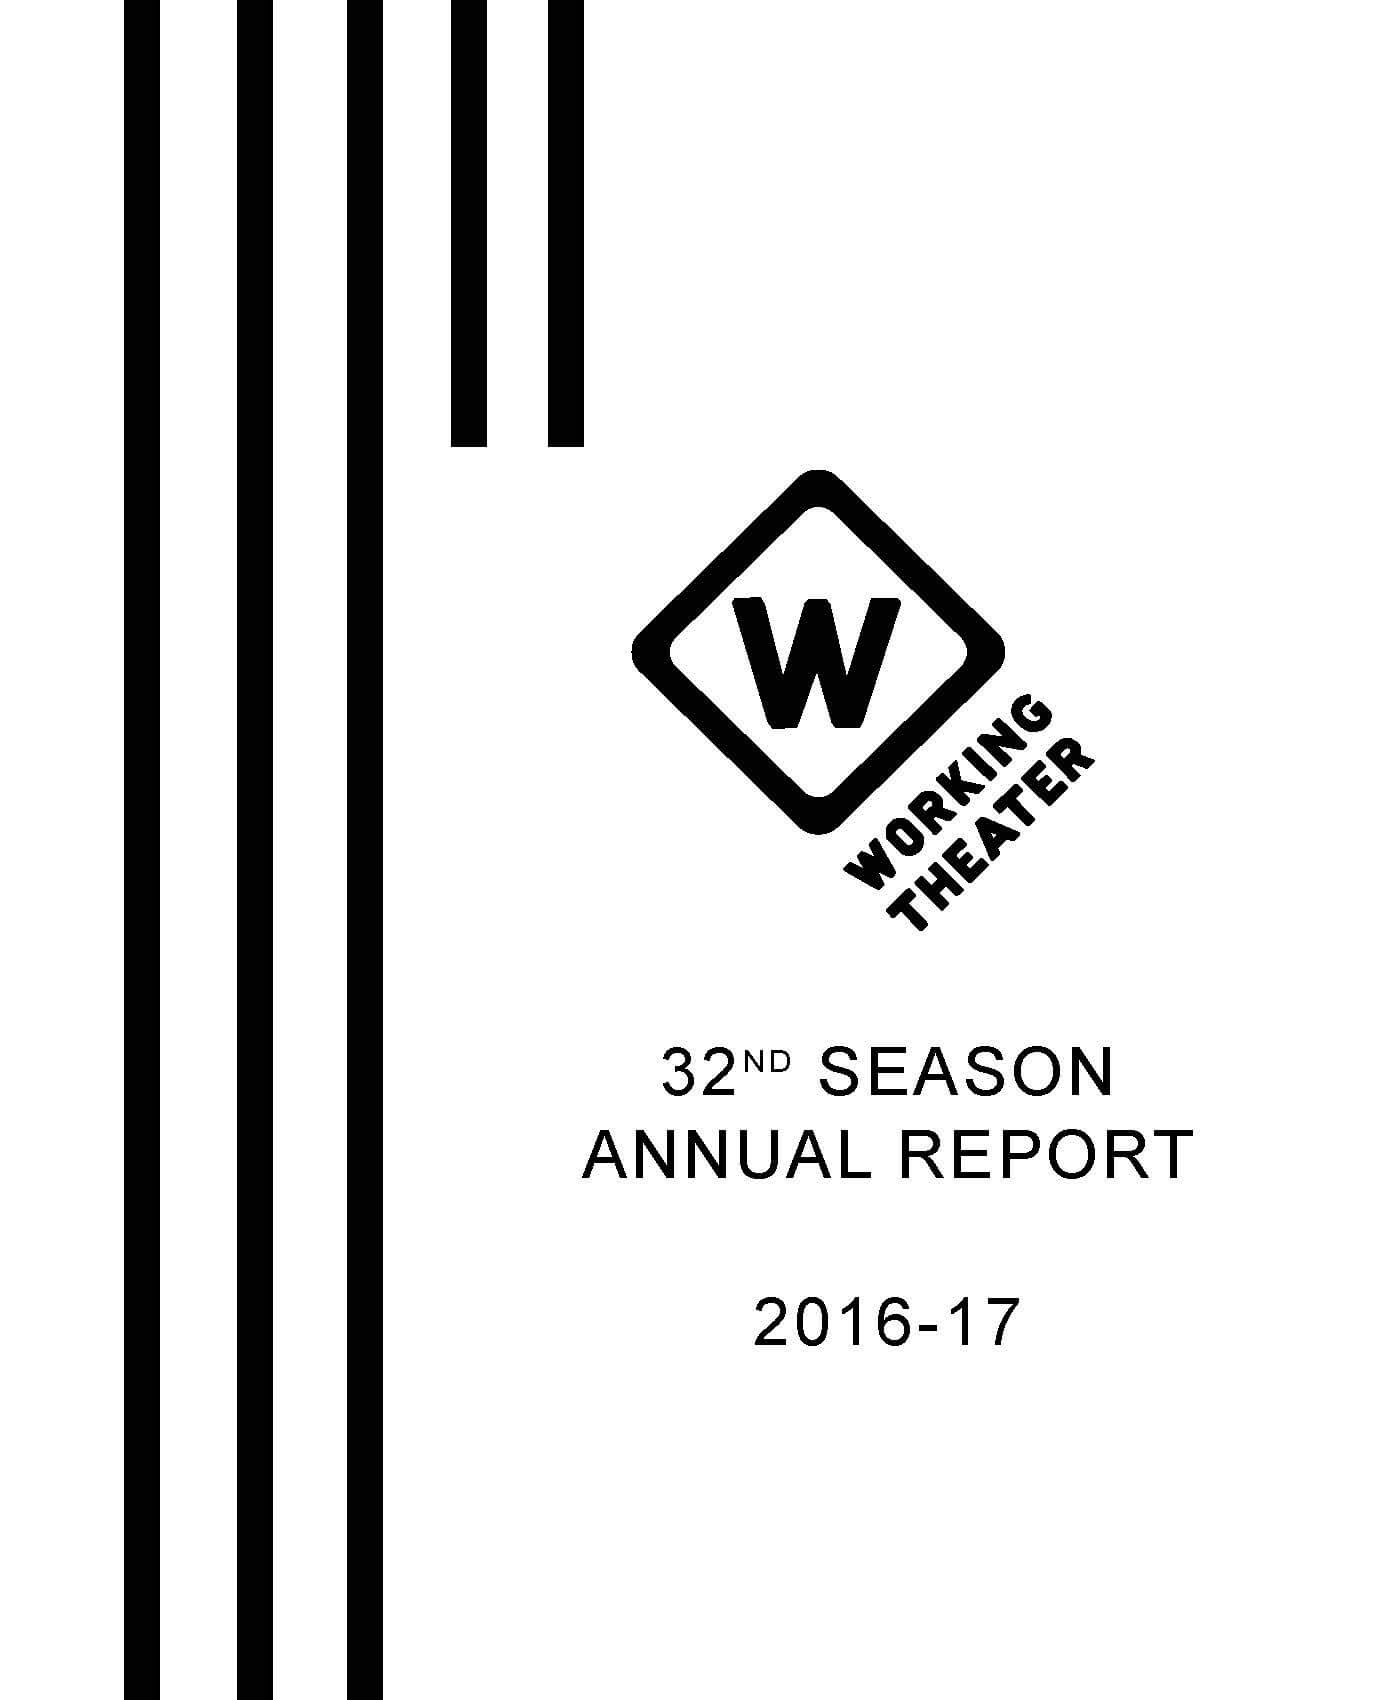 32nd season annual report